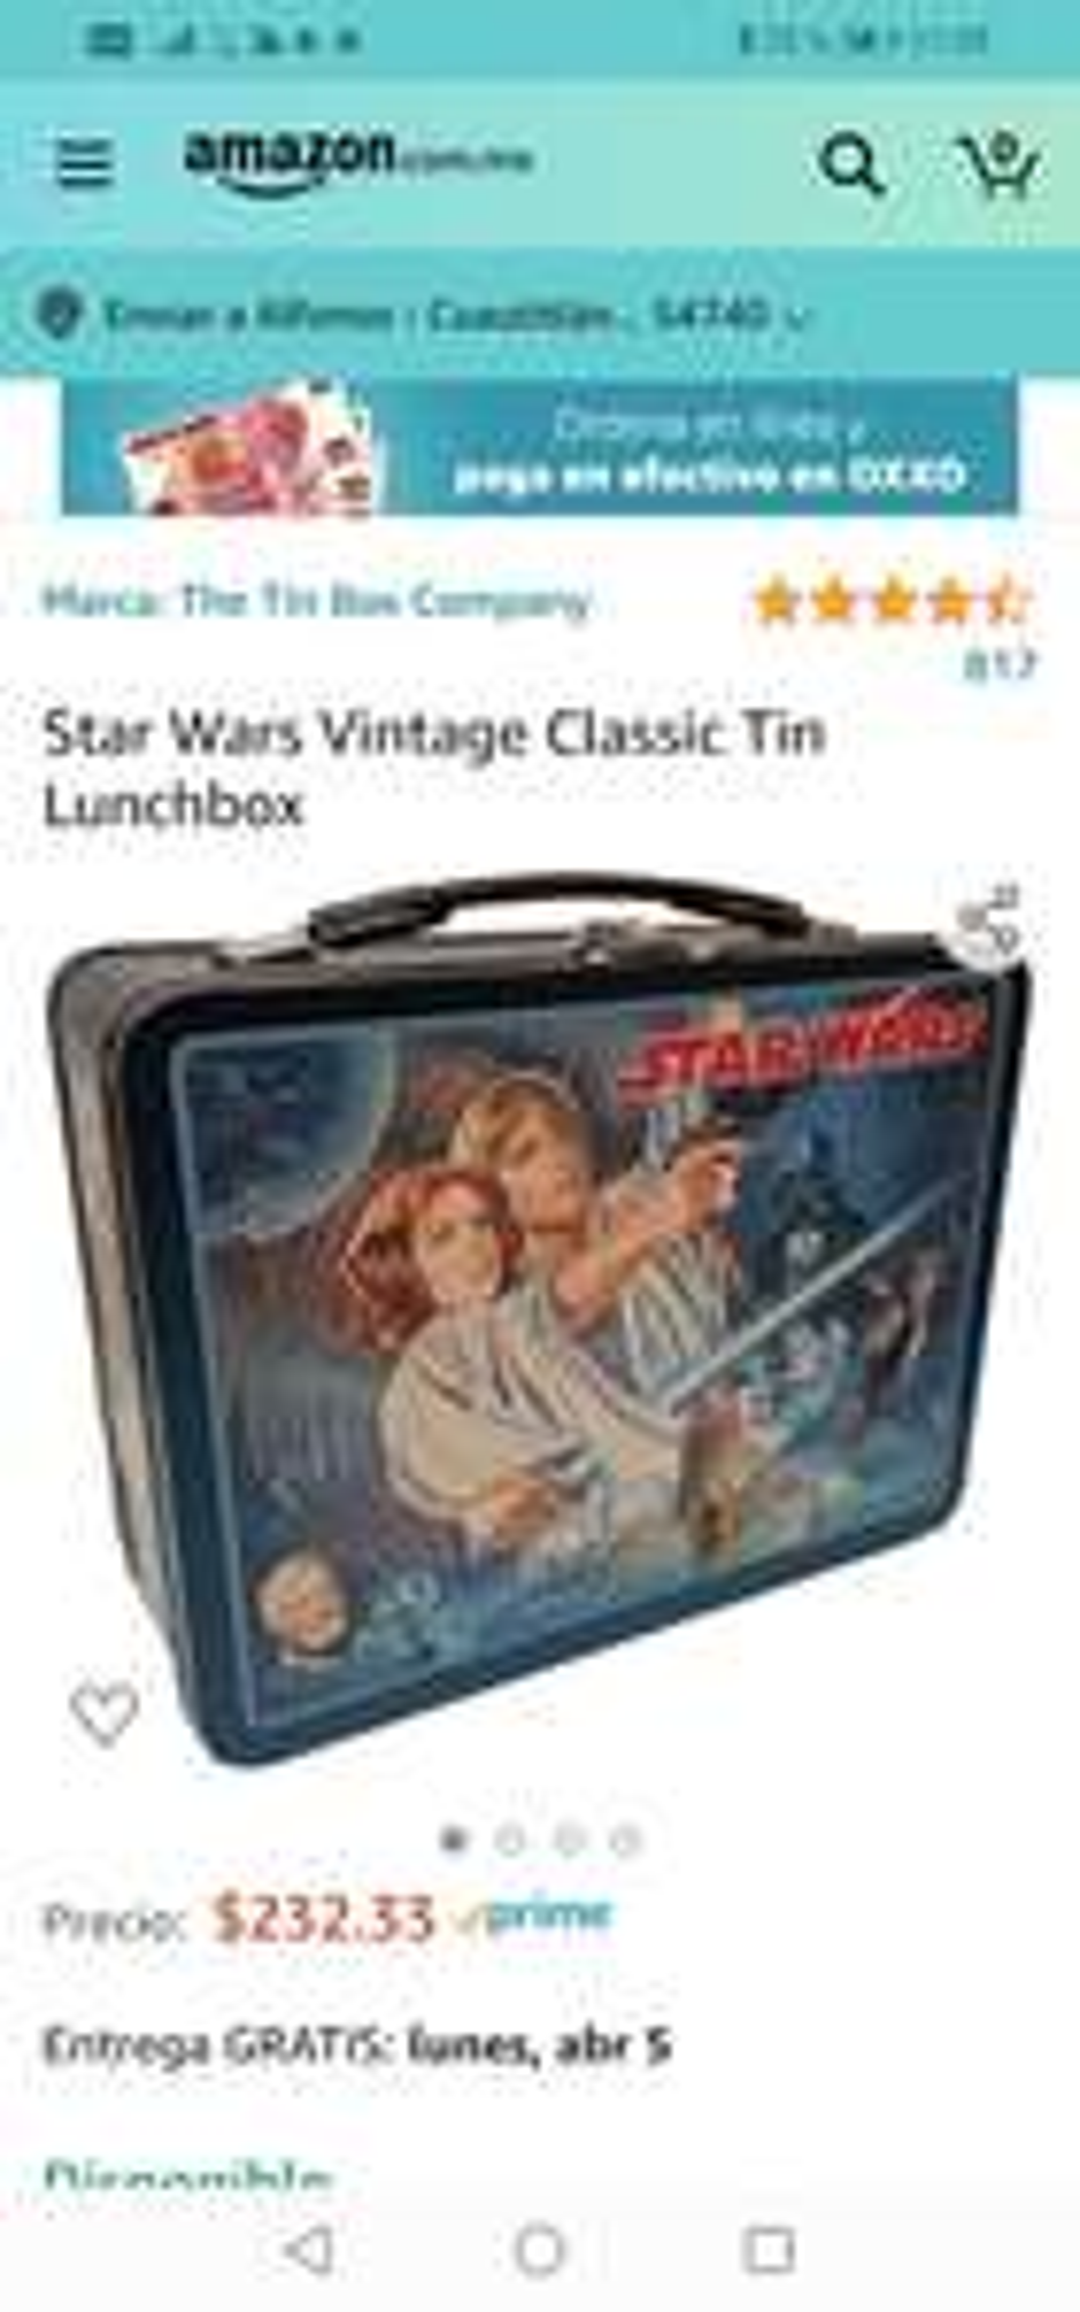 Amazon : Lonchera vintage star wars para llevar ala oficina.